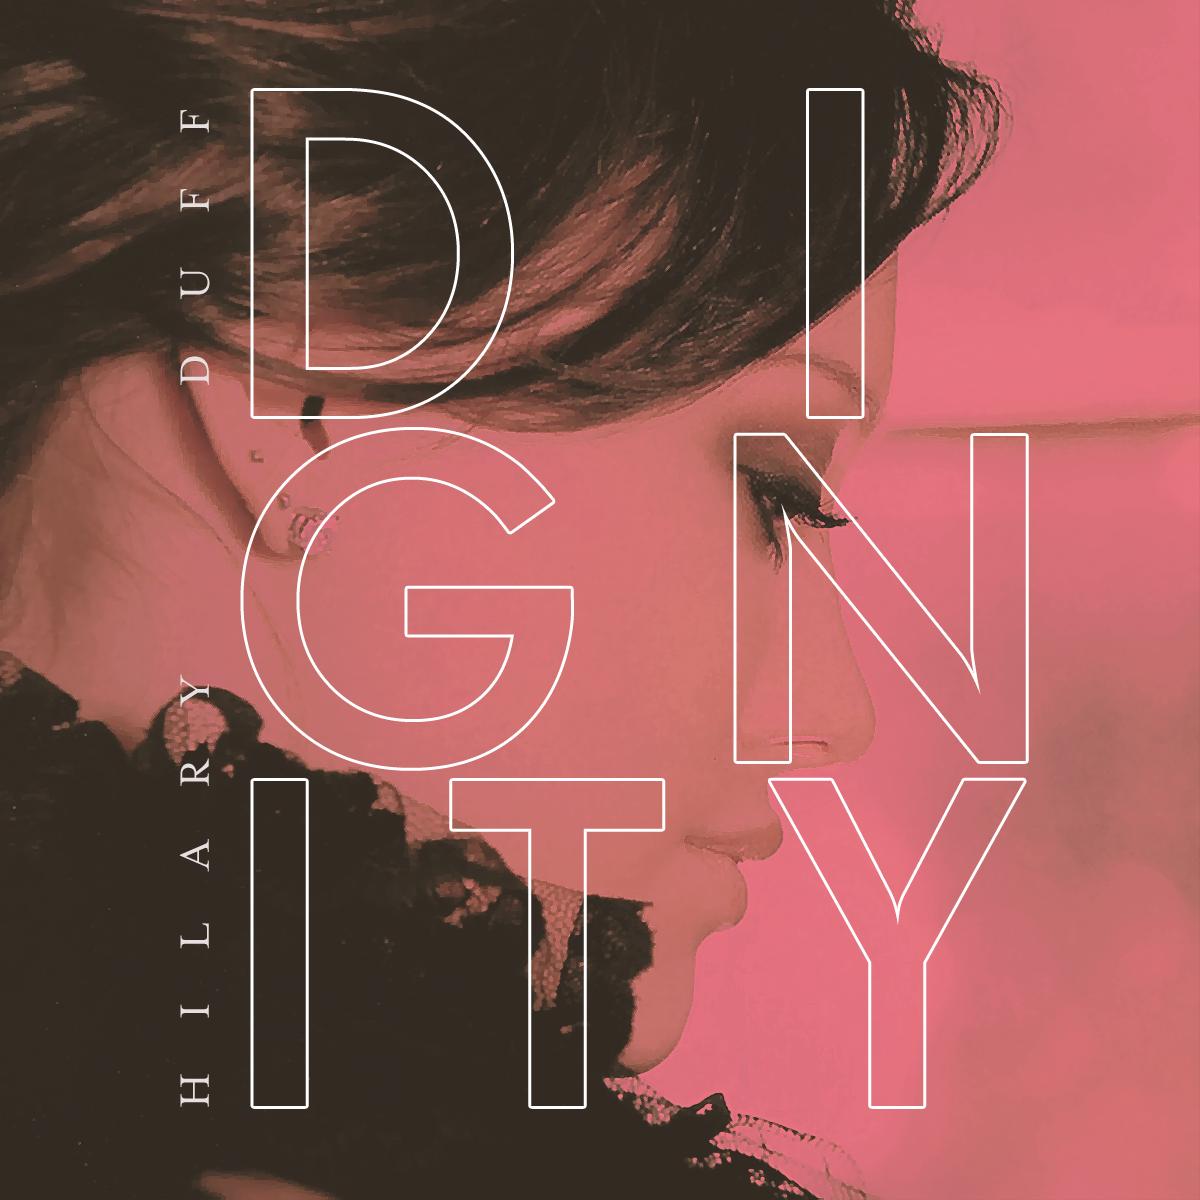 Dignity-Coverde7c0fbd162789c8.png